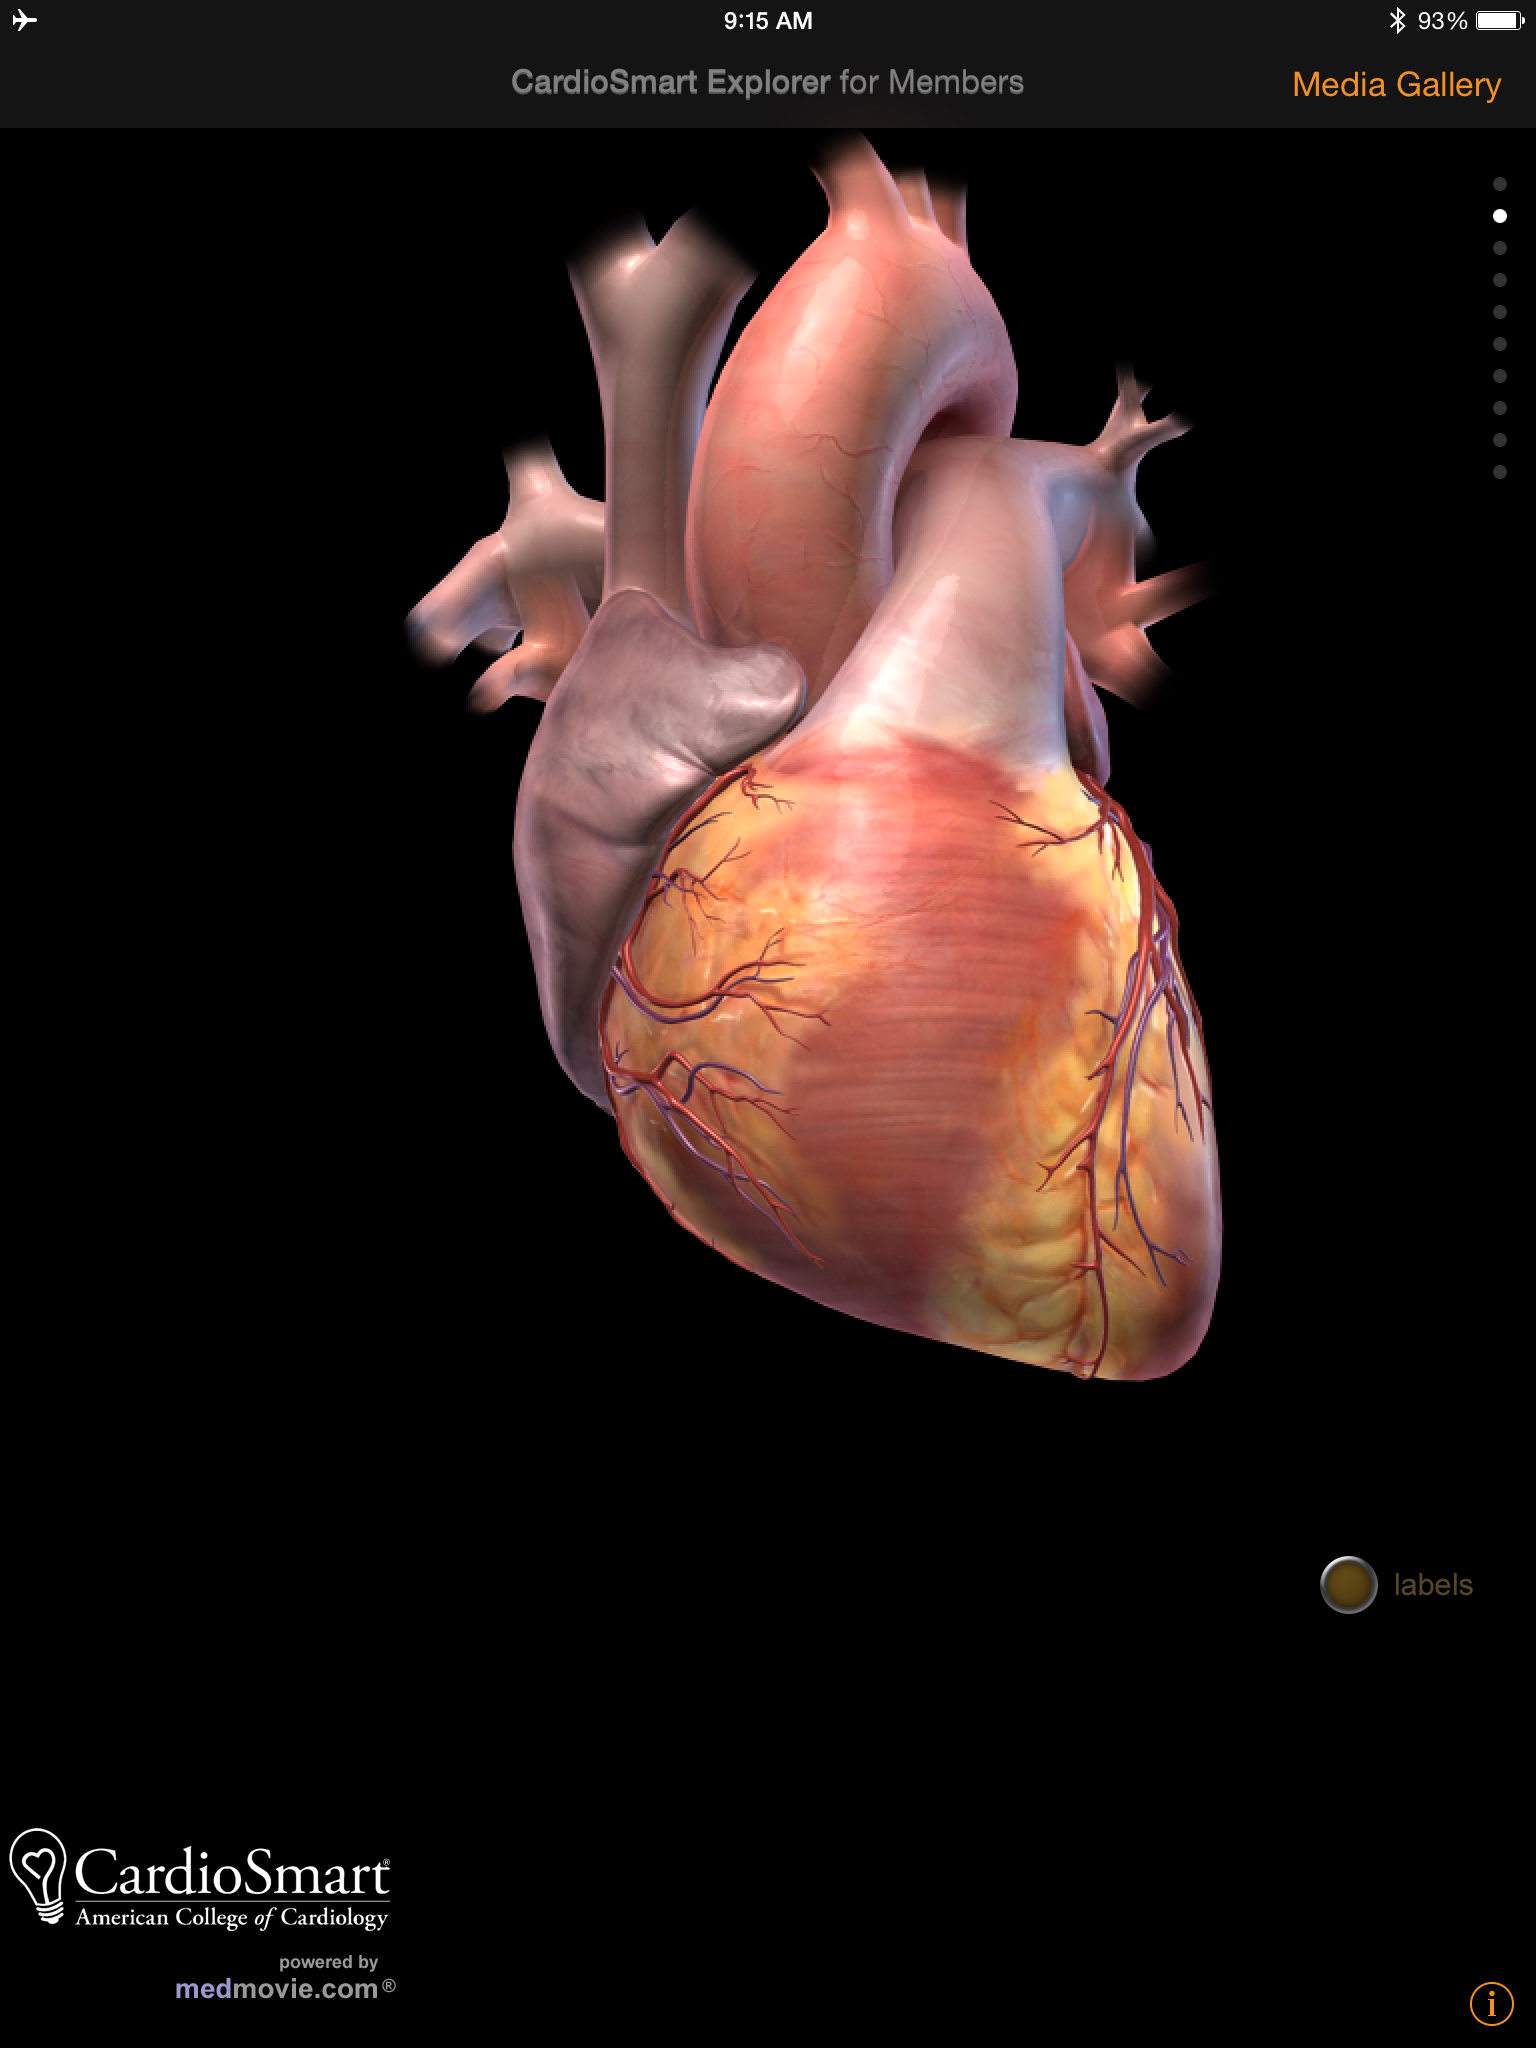 CardioSmart Explorer app review for iPad